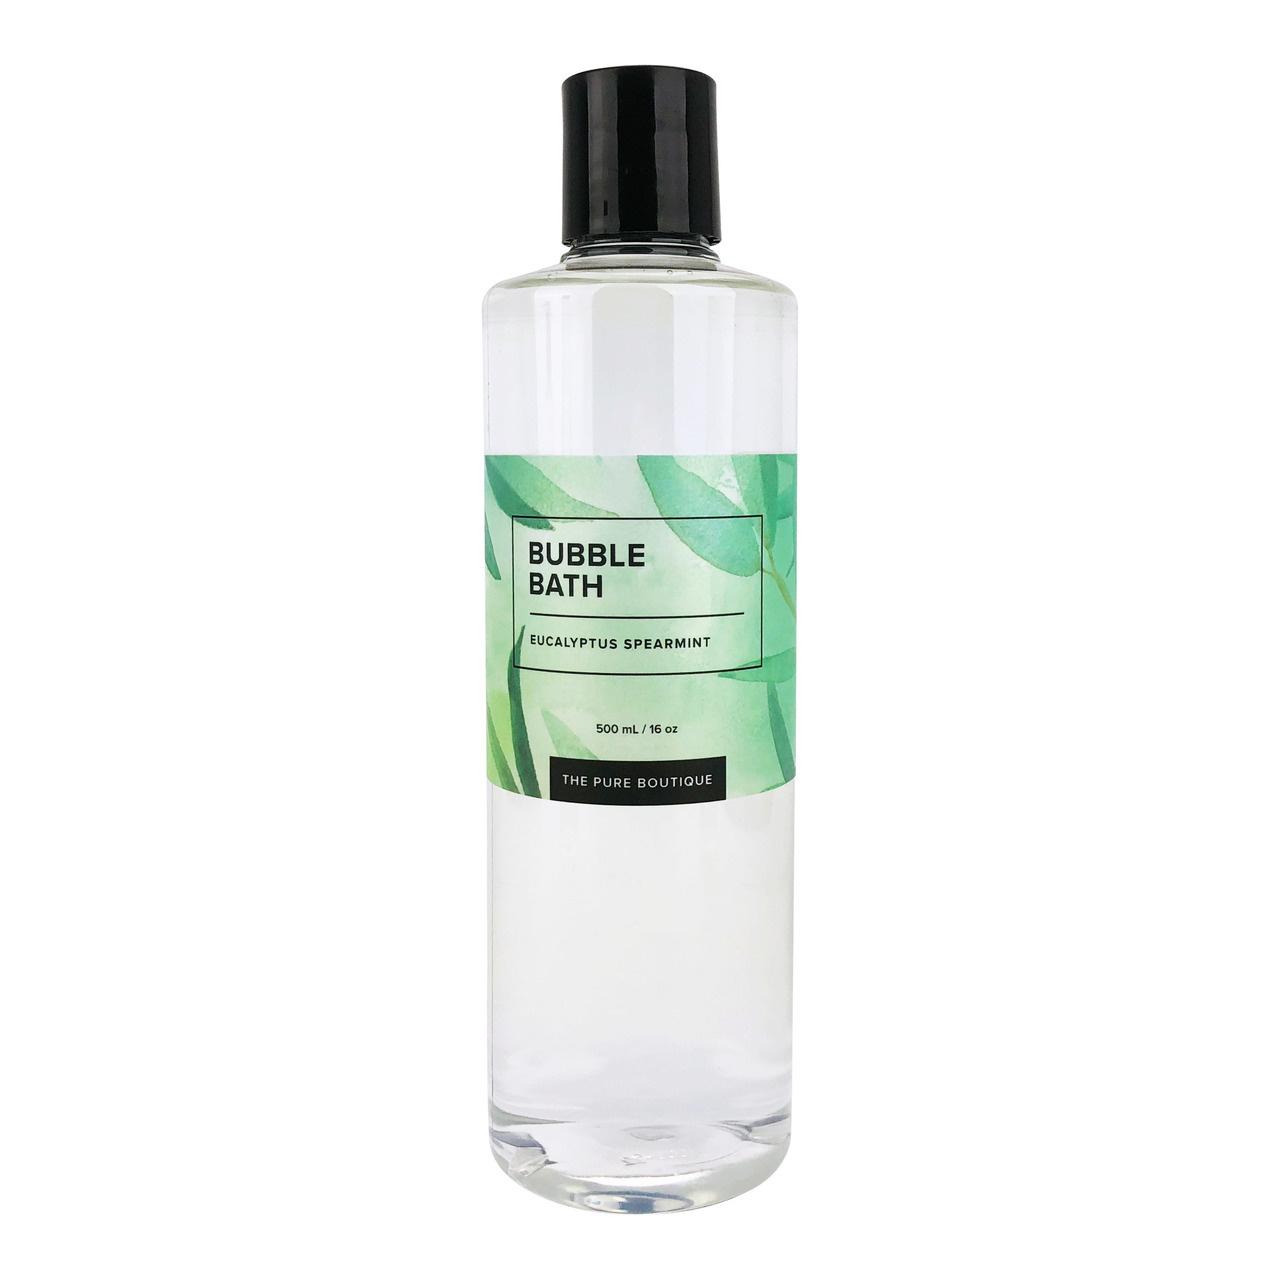 Bubble Bath - Eucalyptus Spearmint-1